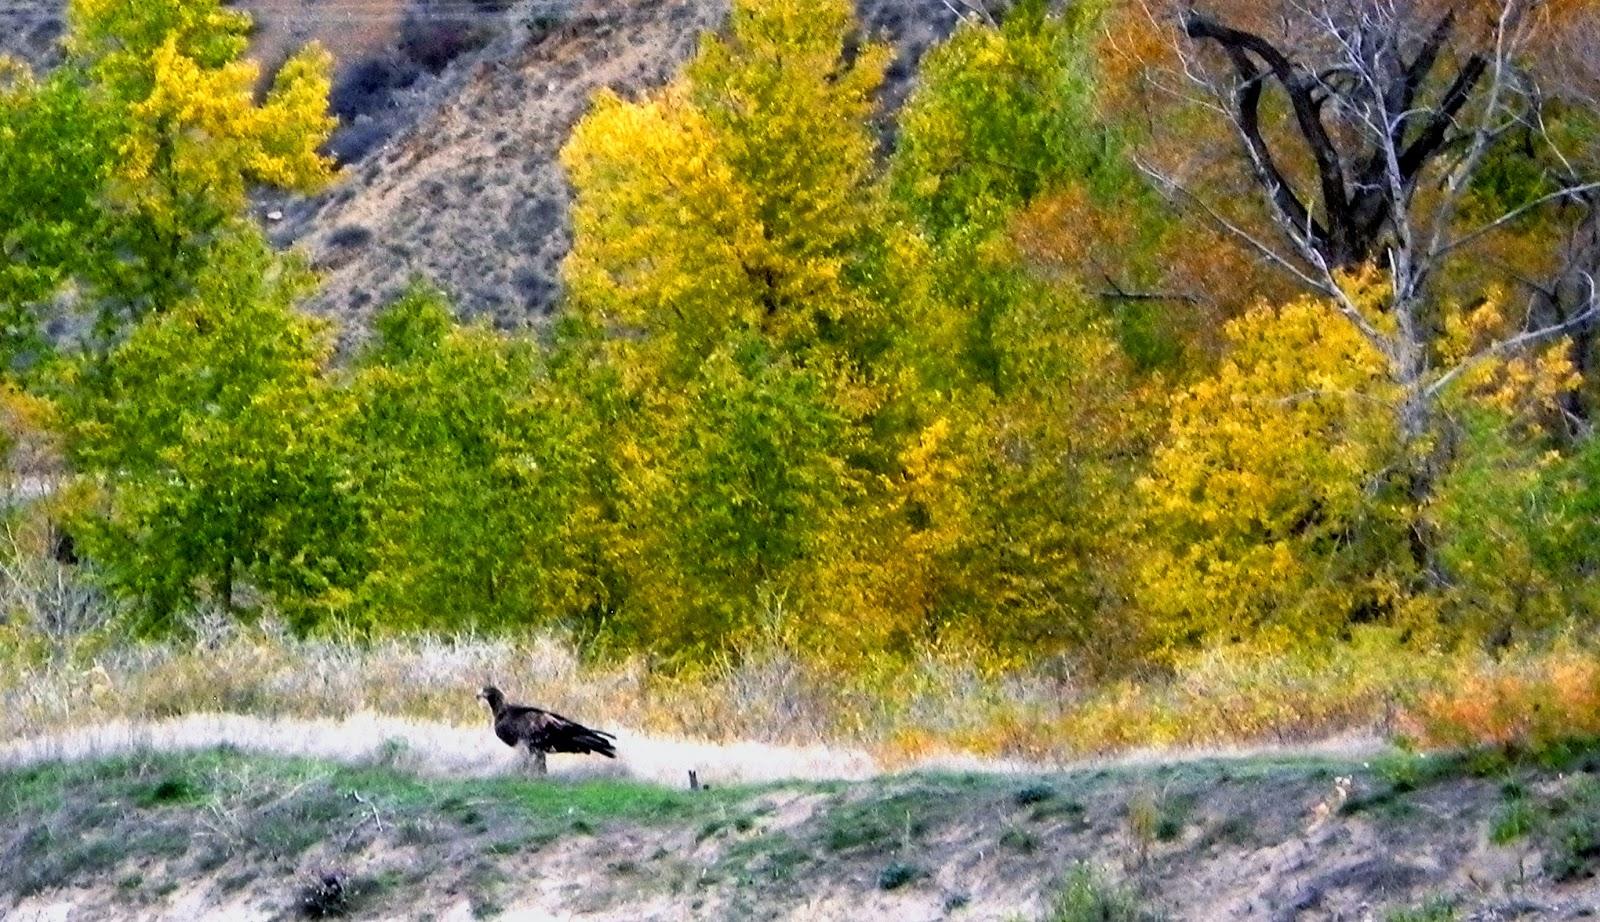 Montana: Missouri River - Fly Fishing - Wild Life